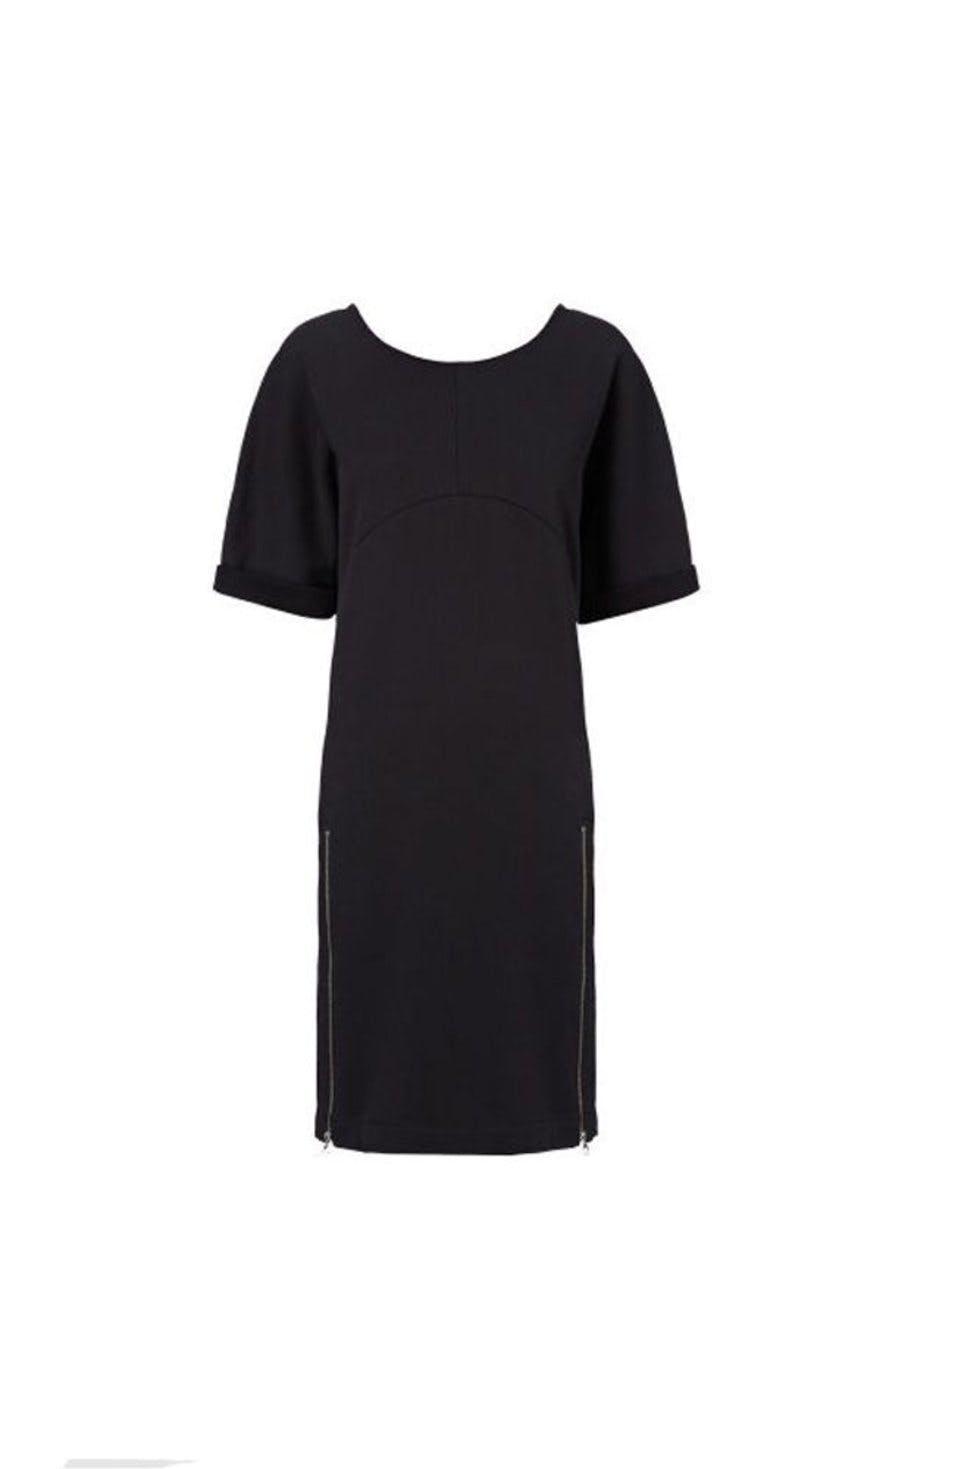 50 Black Dress All Under 163 100 Stylist